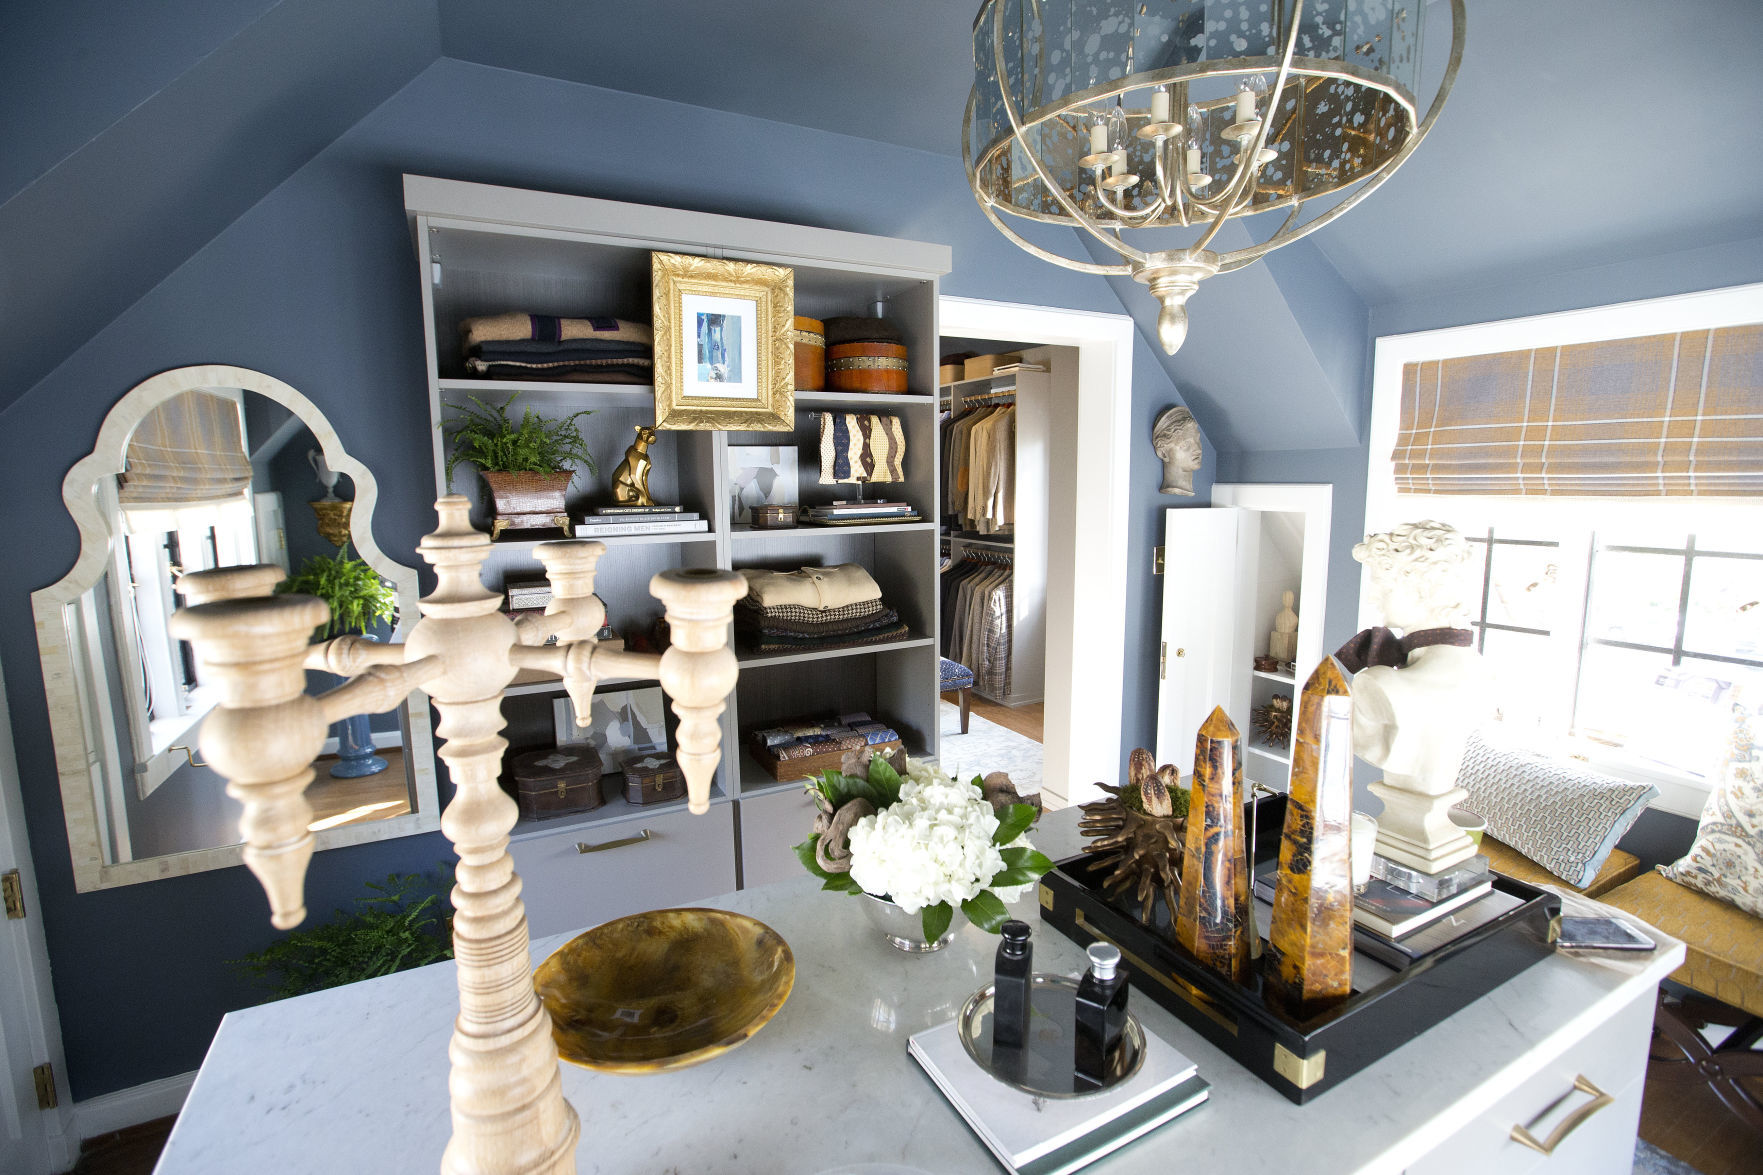 Designer Showhouse at Julian Price House Photos